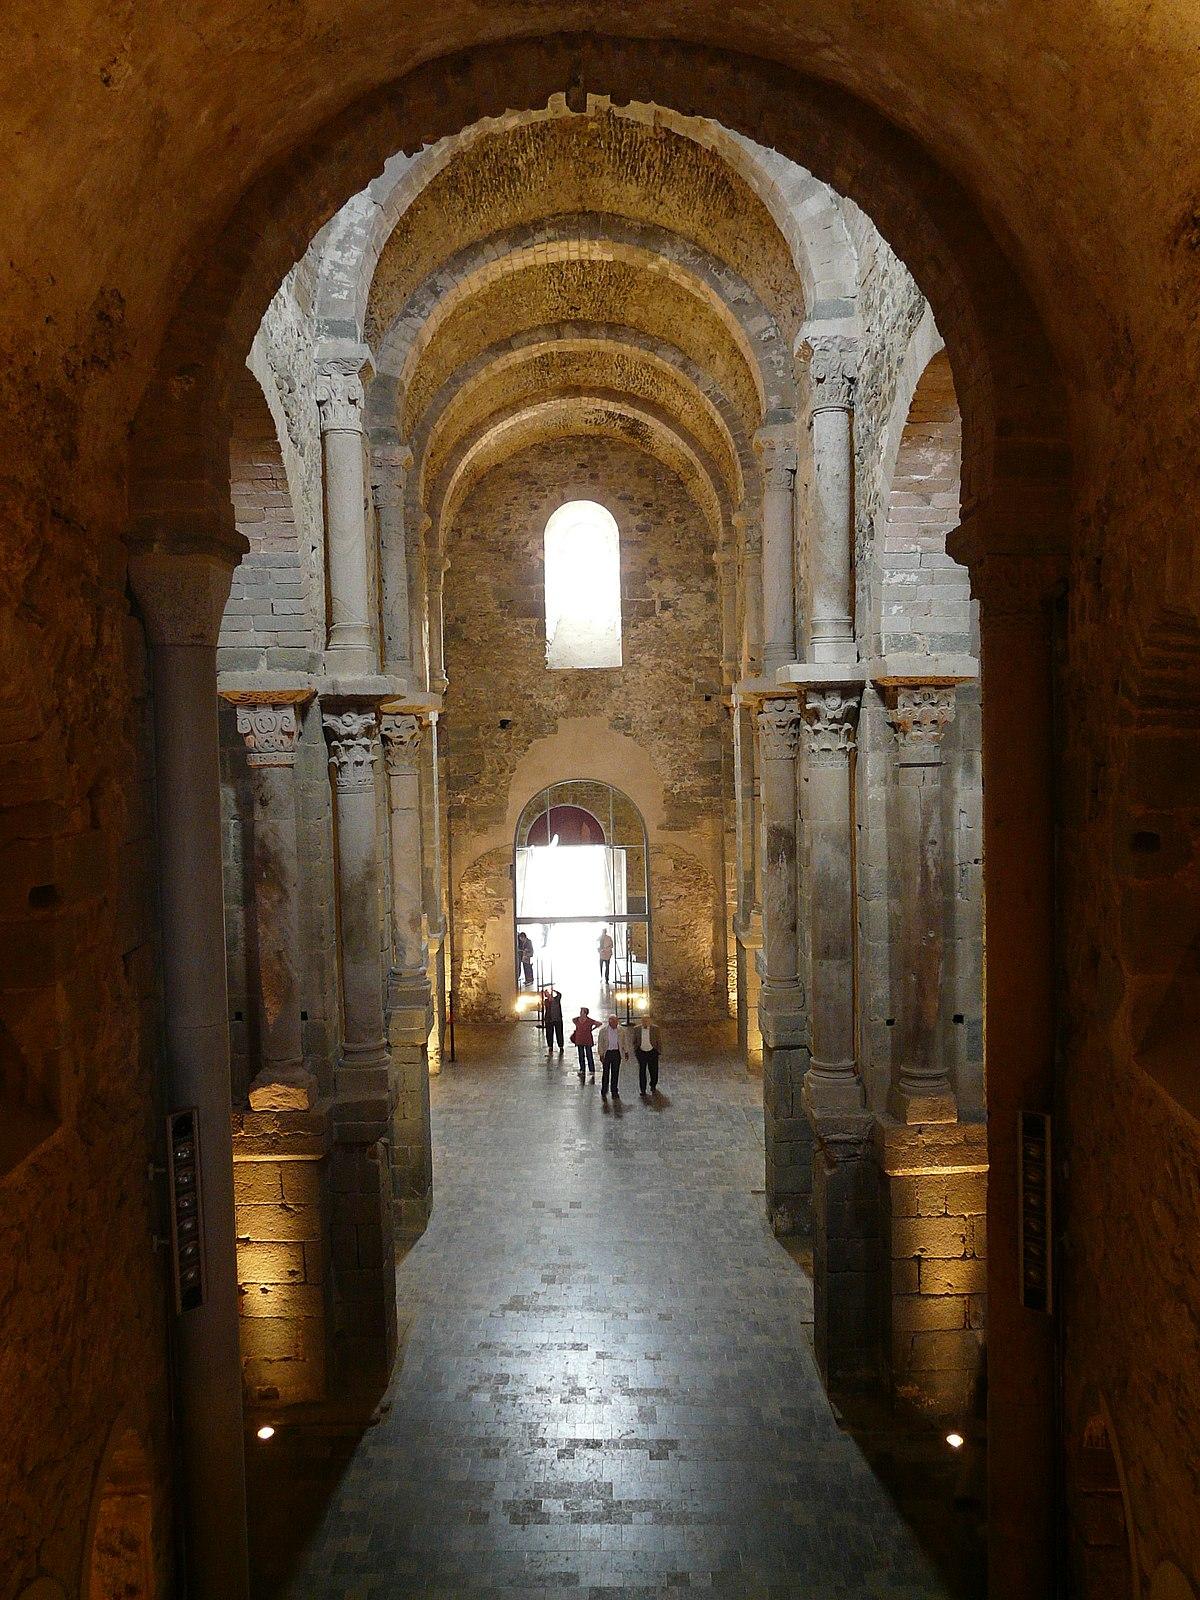 Arquitectura rom nica viquip dia l 39 enciclop dia lliure for Interior iglesia romanica